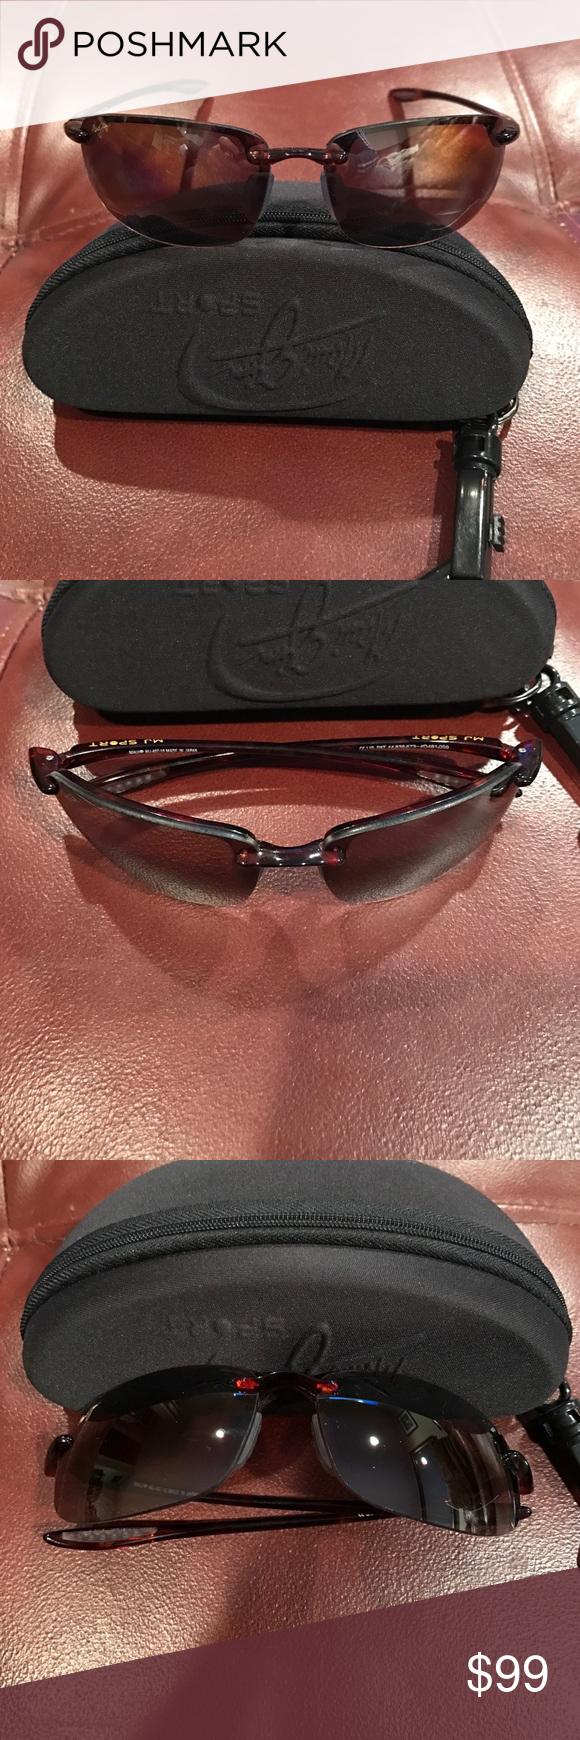 Prescription Sunglasses   Pinterest   Polarized fishing sunglasses